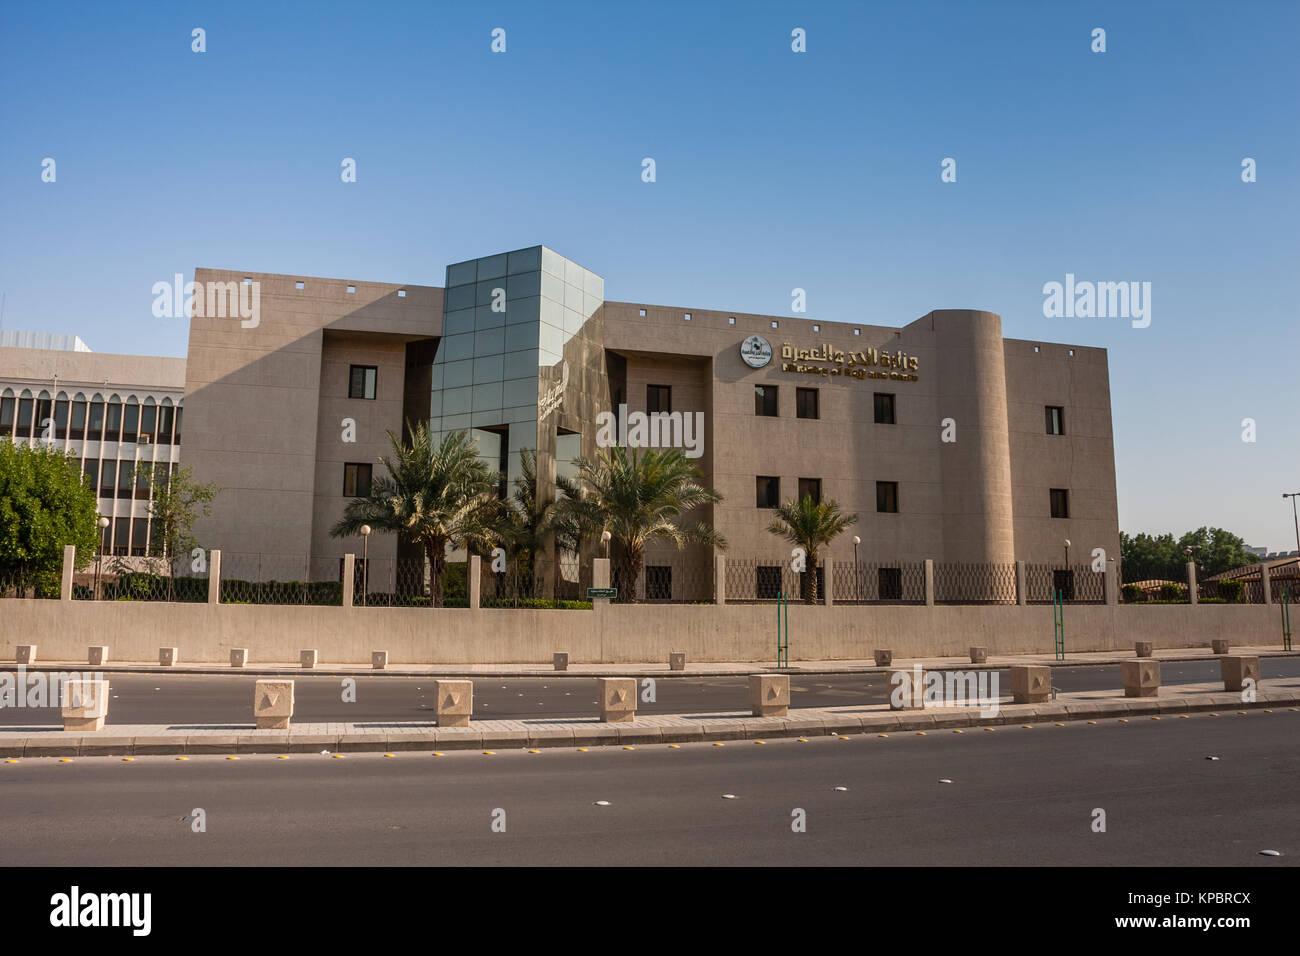 Le Ministère du Hadj et Omra, Riyadh, Arabie Saoudite Photo Stock